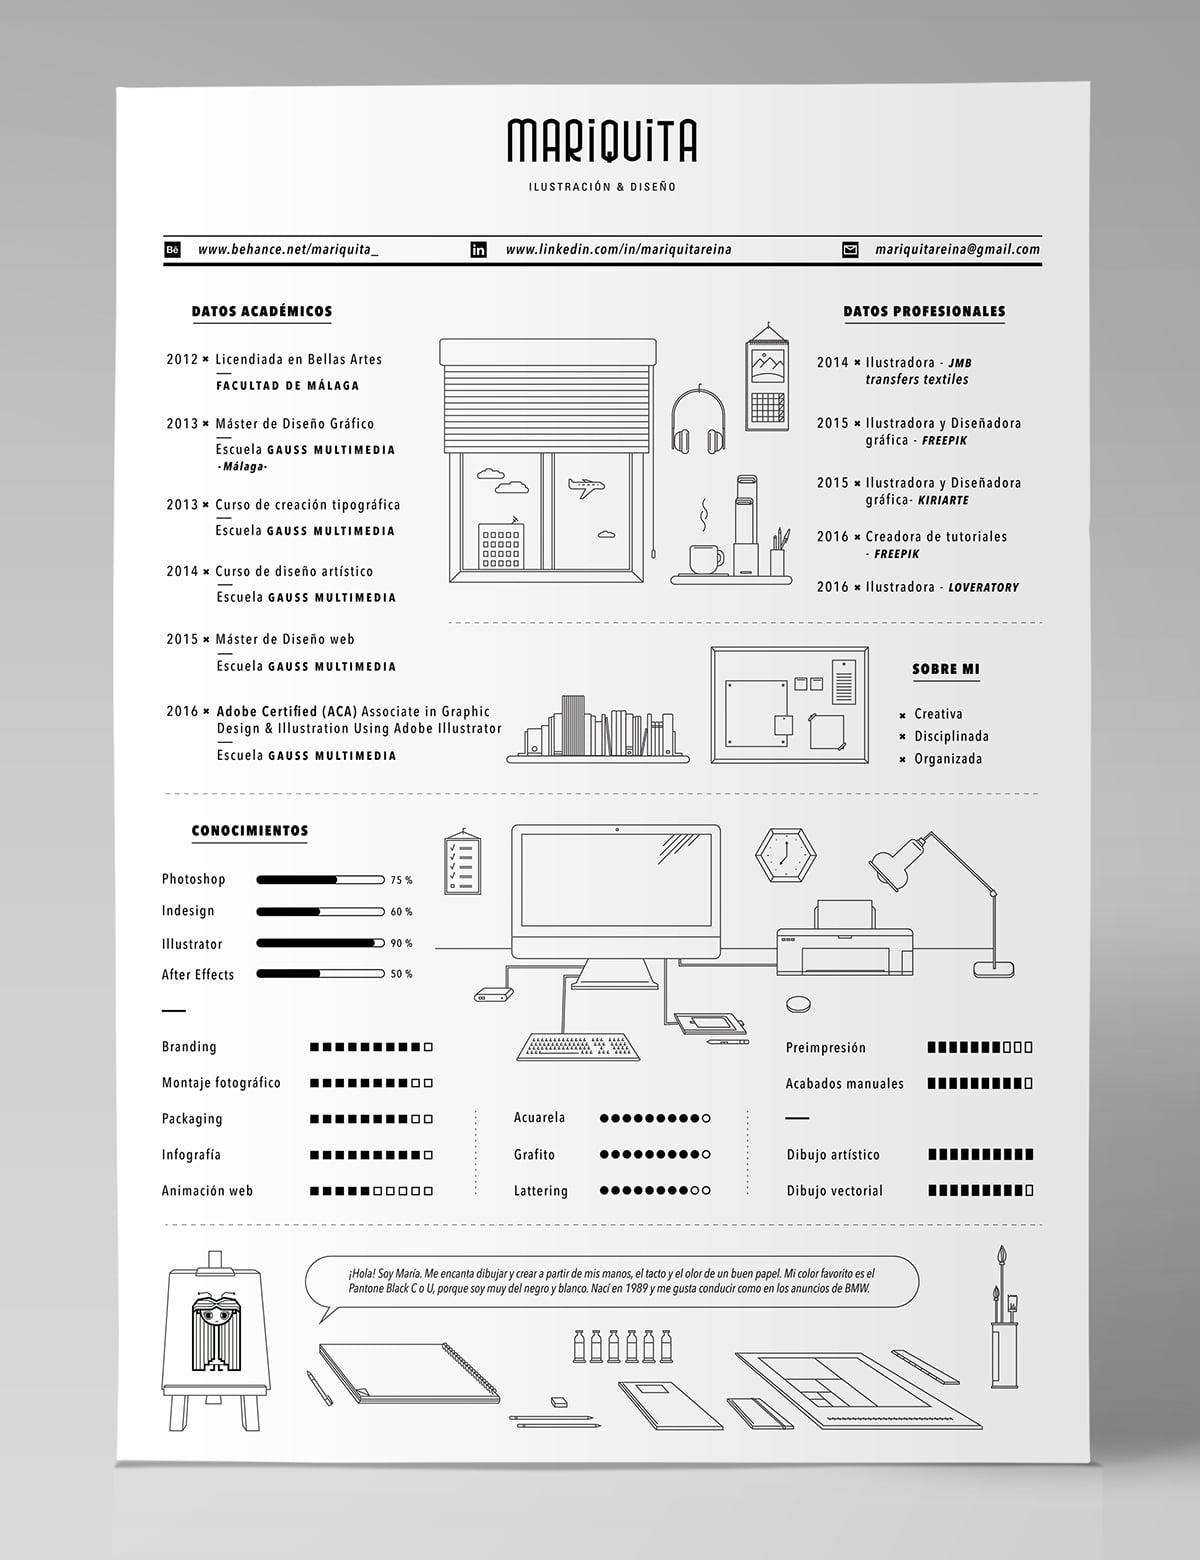 cara membuat cv dalam format pdf